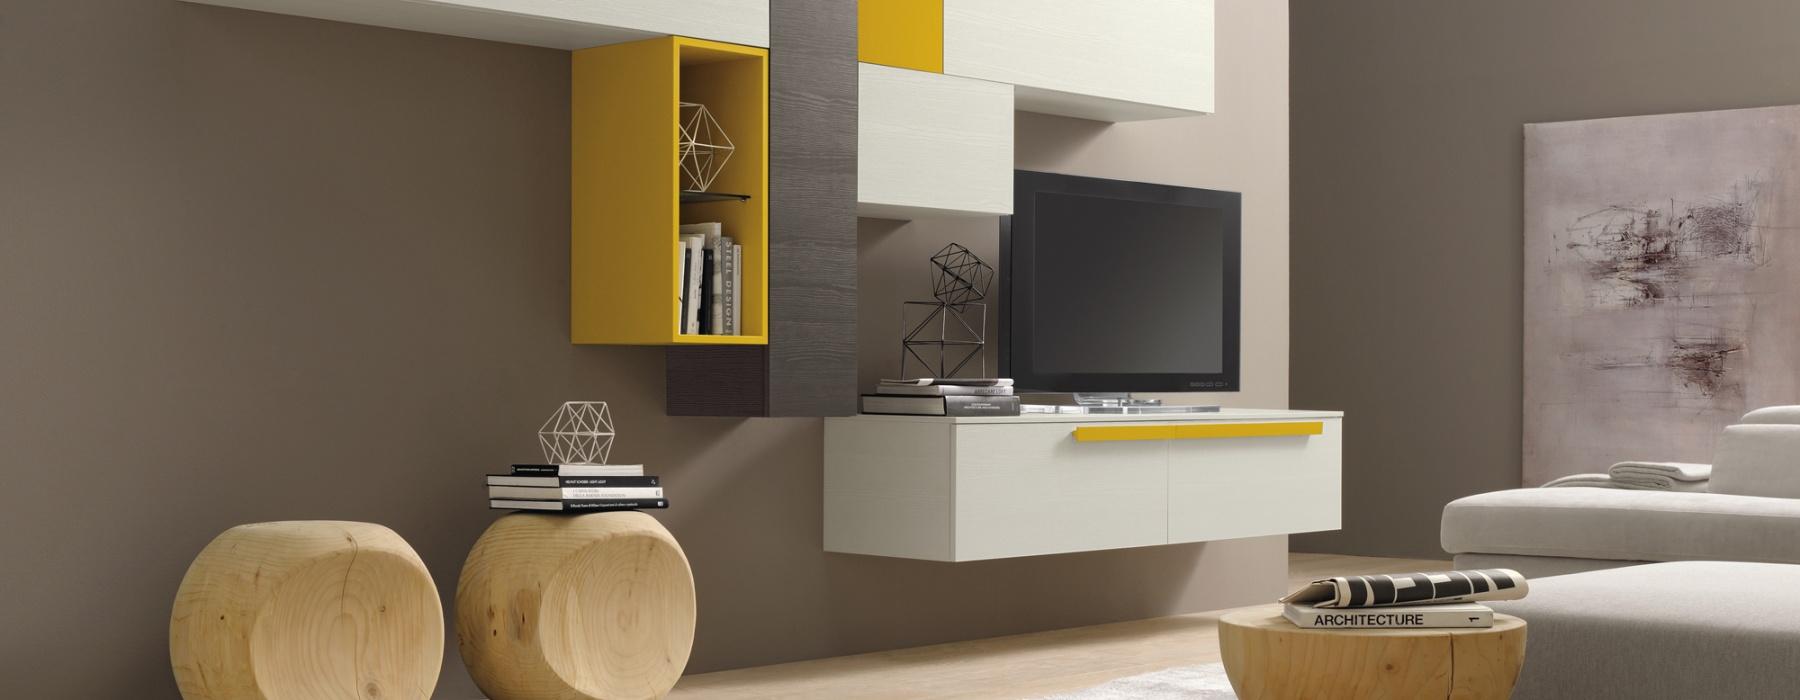 Catalogo Living. Catlogo Luxury With Catalogo Living. Interior ...